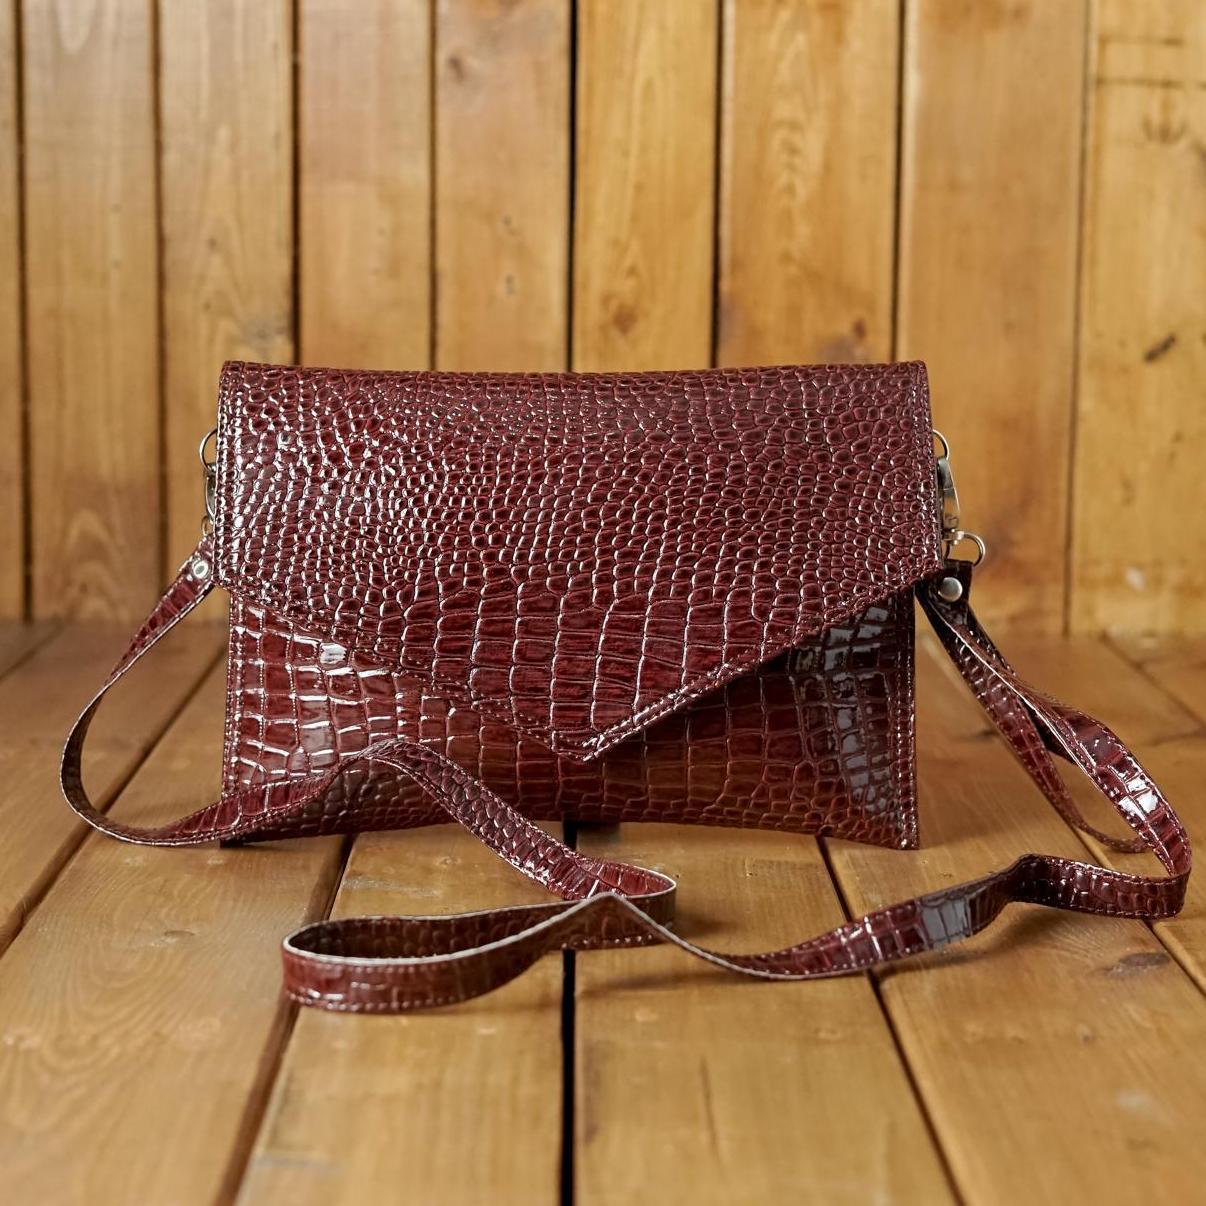 Detail Gambar Zelig official New Fashion Cluth Motif Crocodile   Dompet  Pesta Wanita   Tas selempang d00f6e7dd0